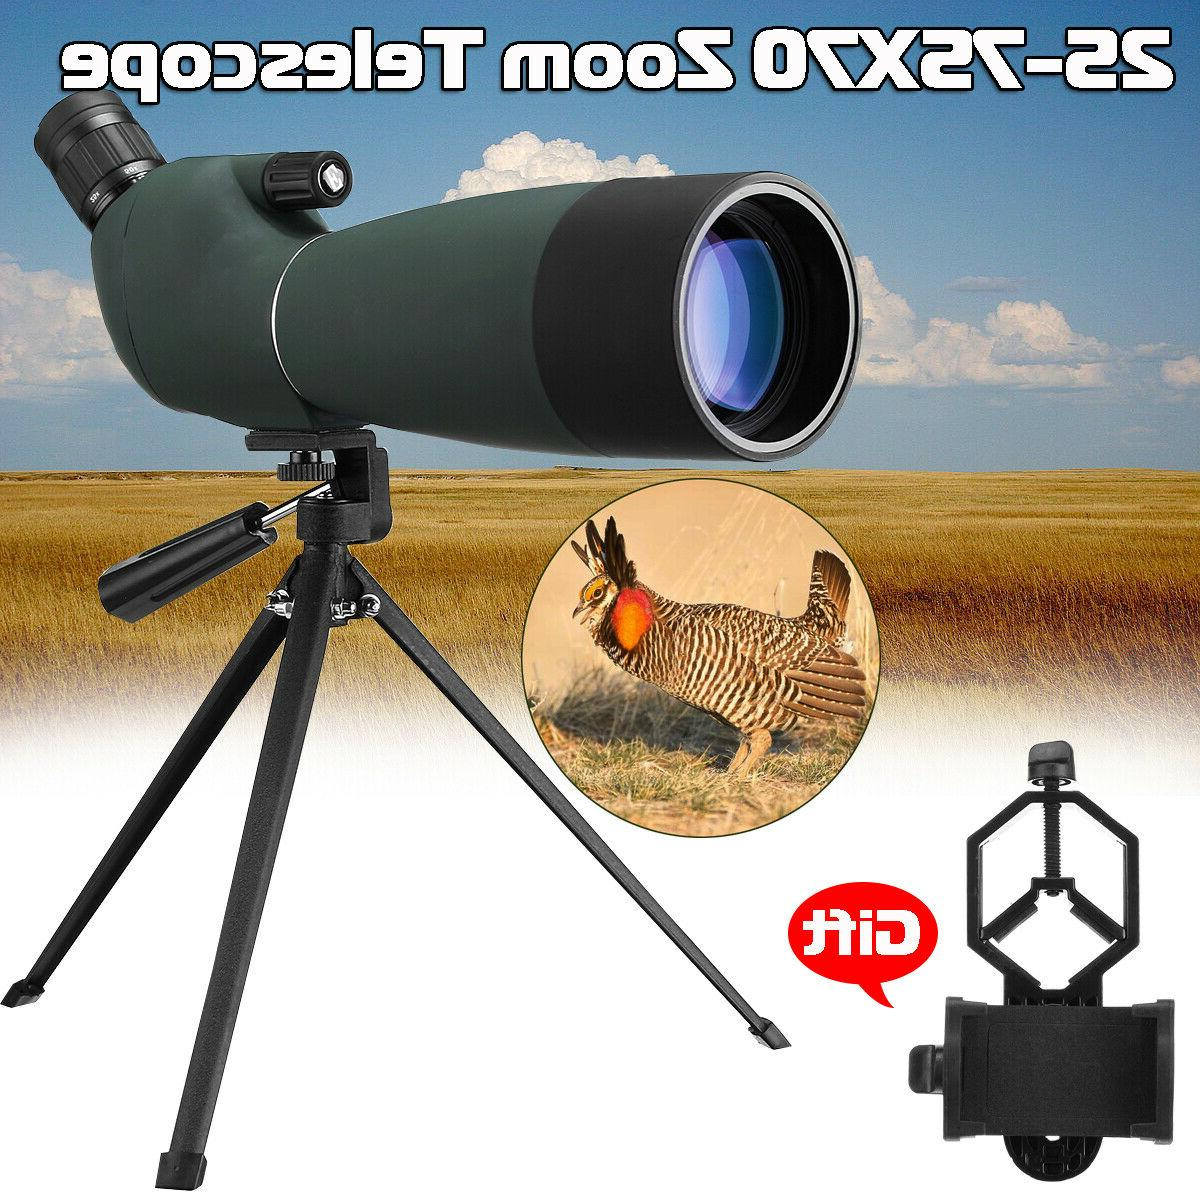 25 75x75 waterproof spotting scope zoom binoculars